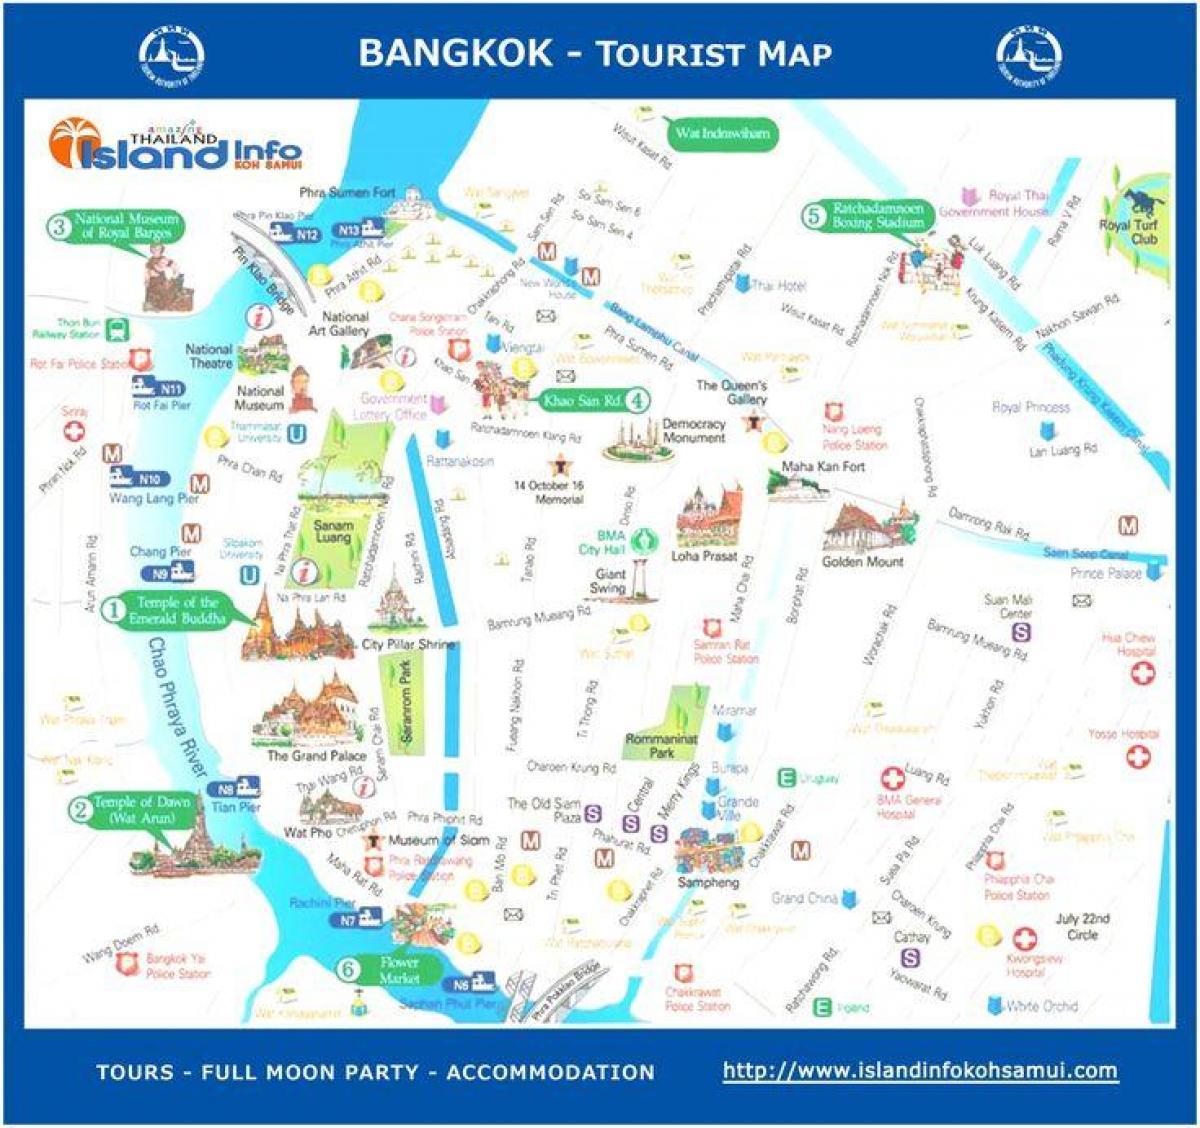 Bangkok peta wisata - Bangkok thailand tourist map (Thailand)